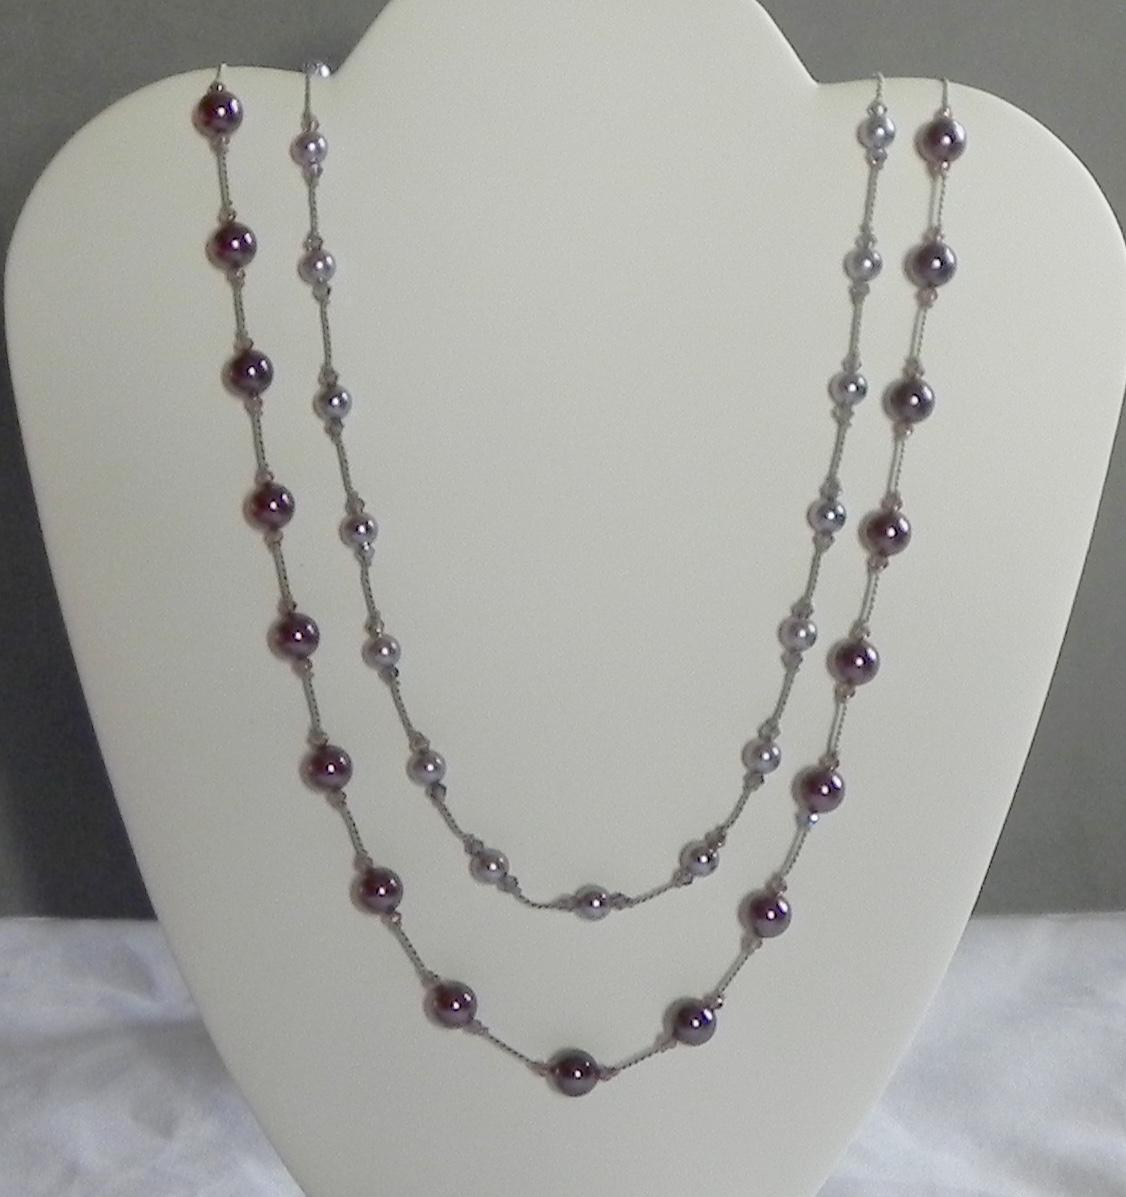 Swarovski Pearls #472